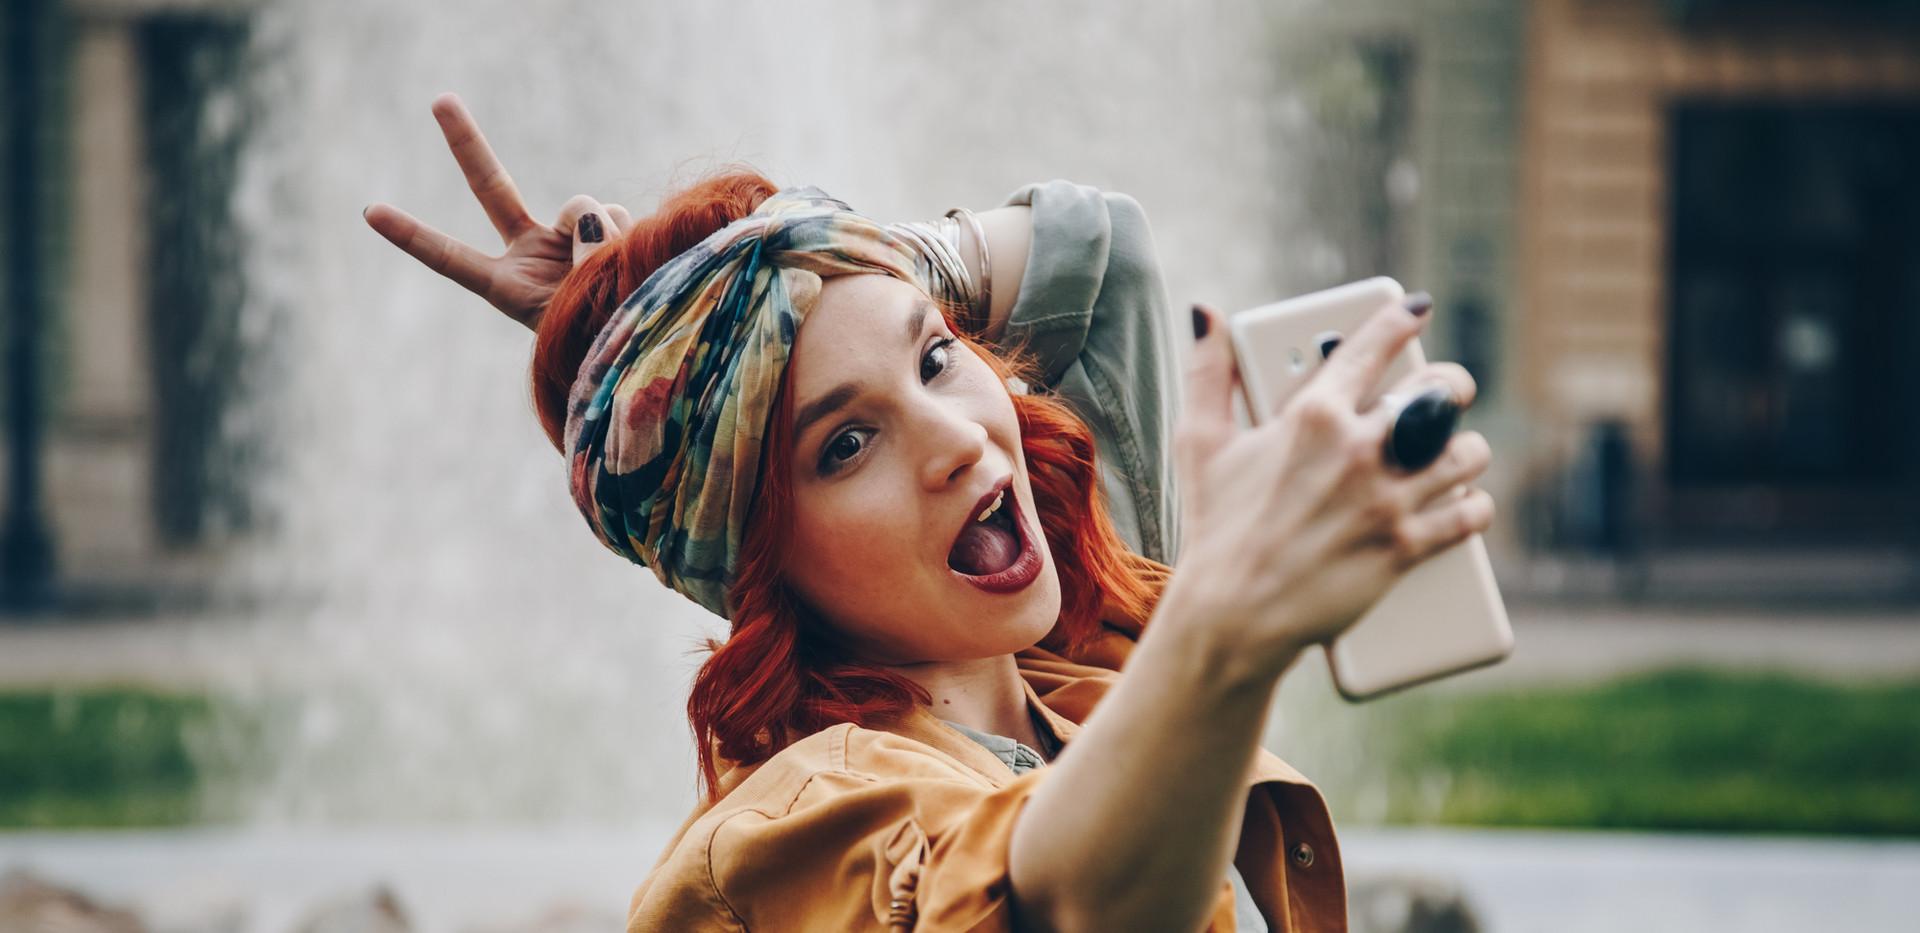 Silly Selfie